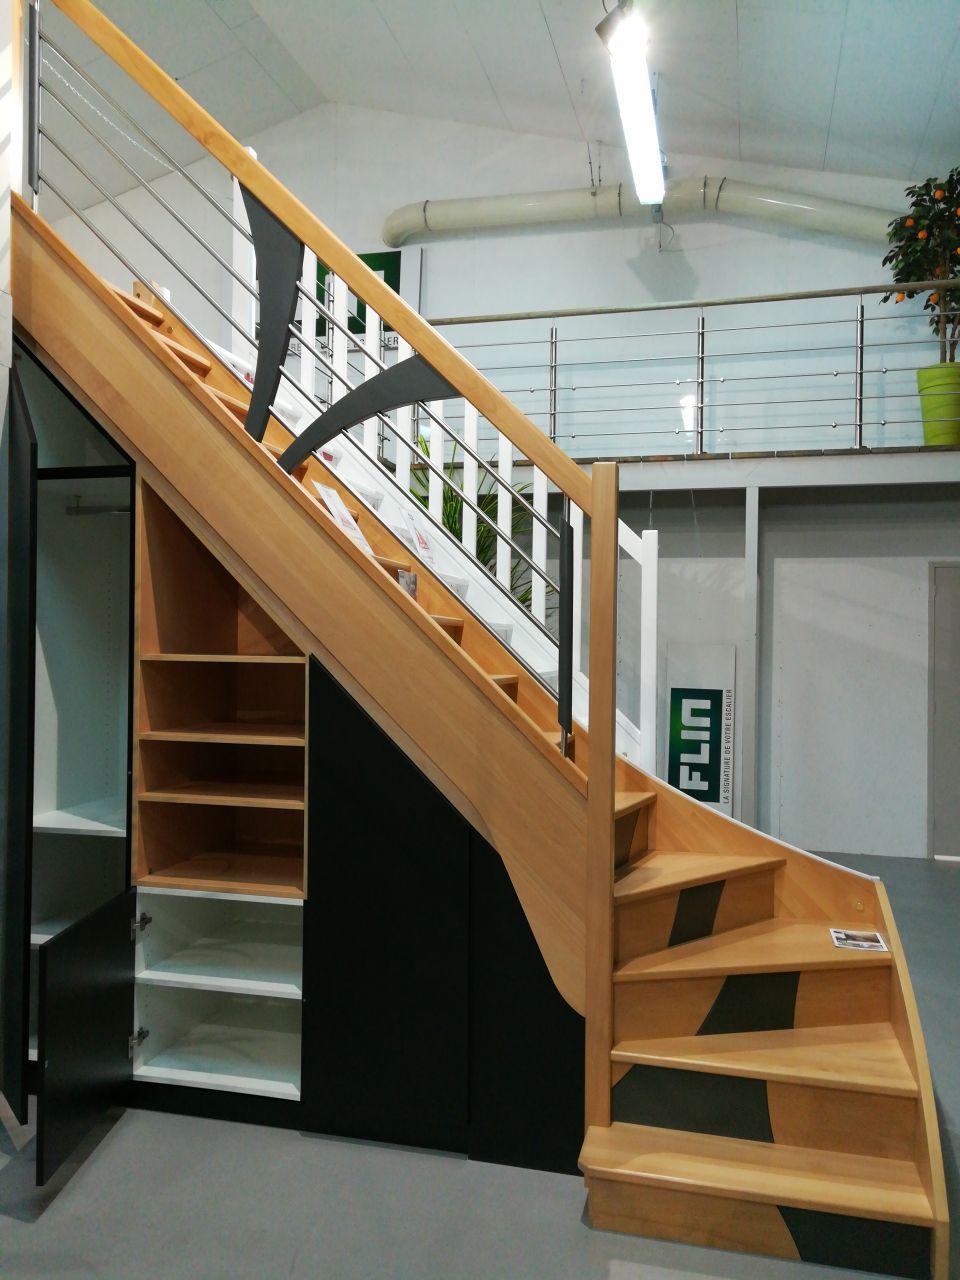 Escalier F76 quart tournant bas gauche Flin